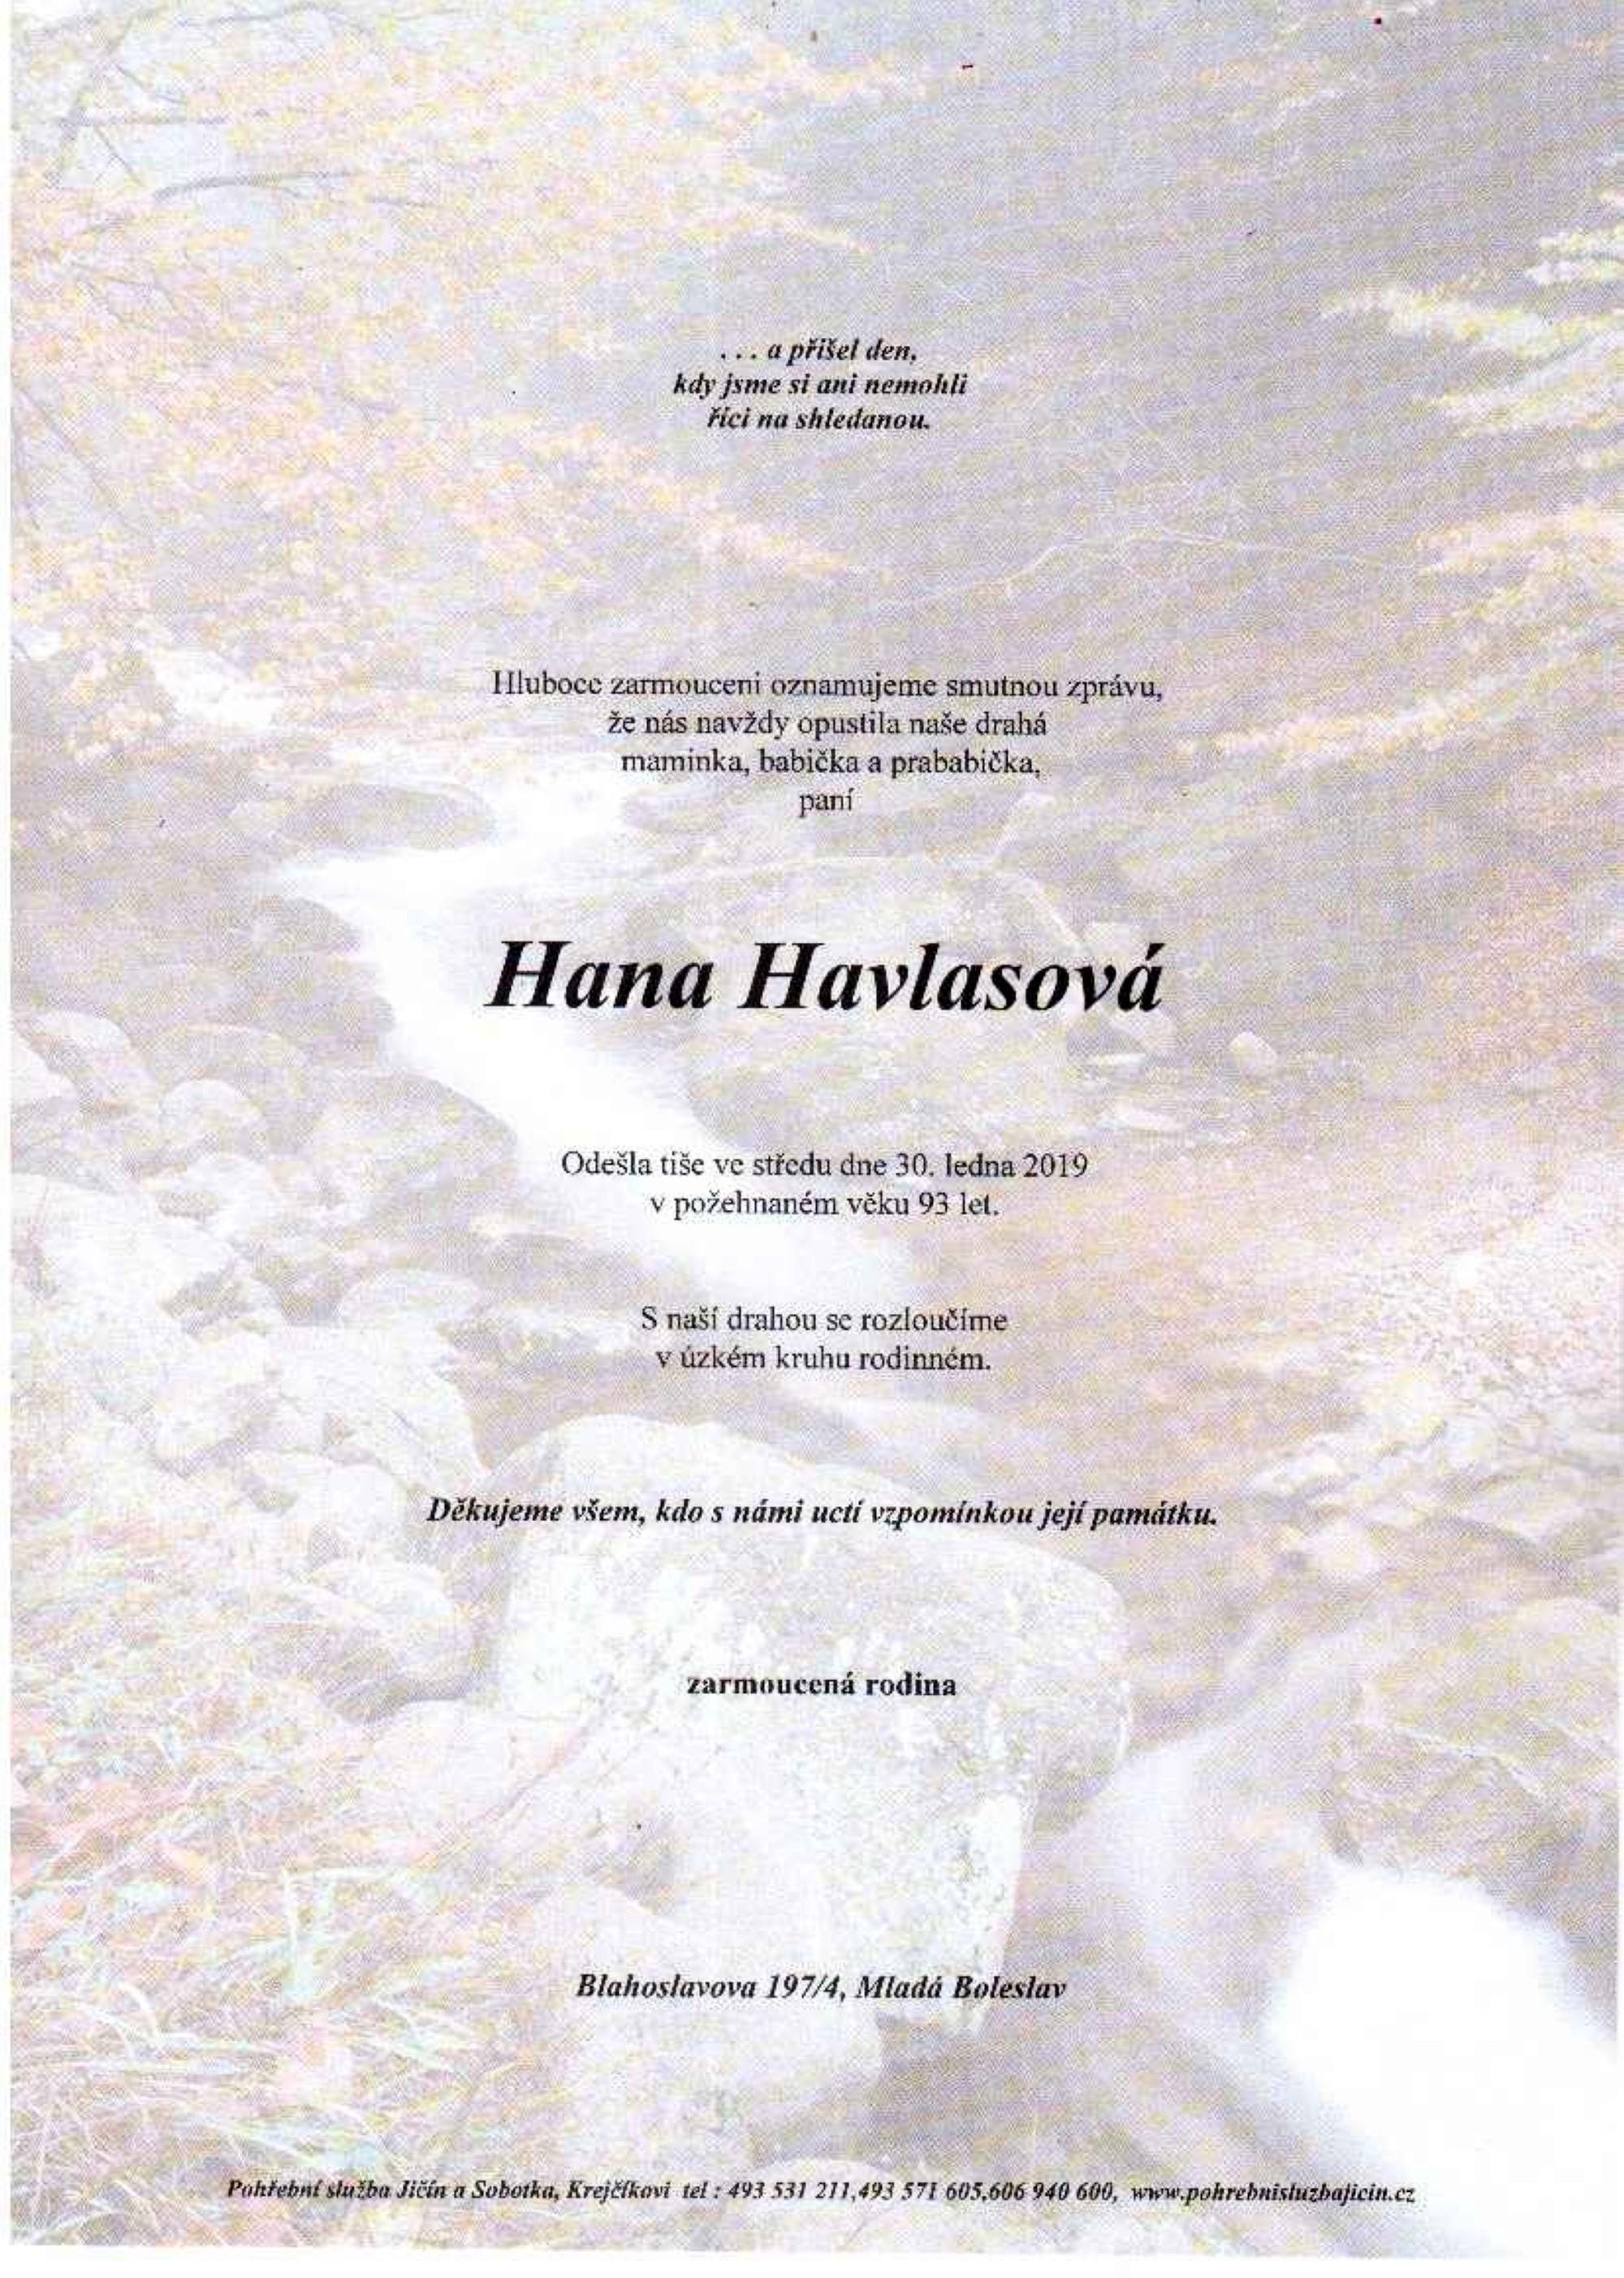 Hana Havlasová